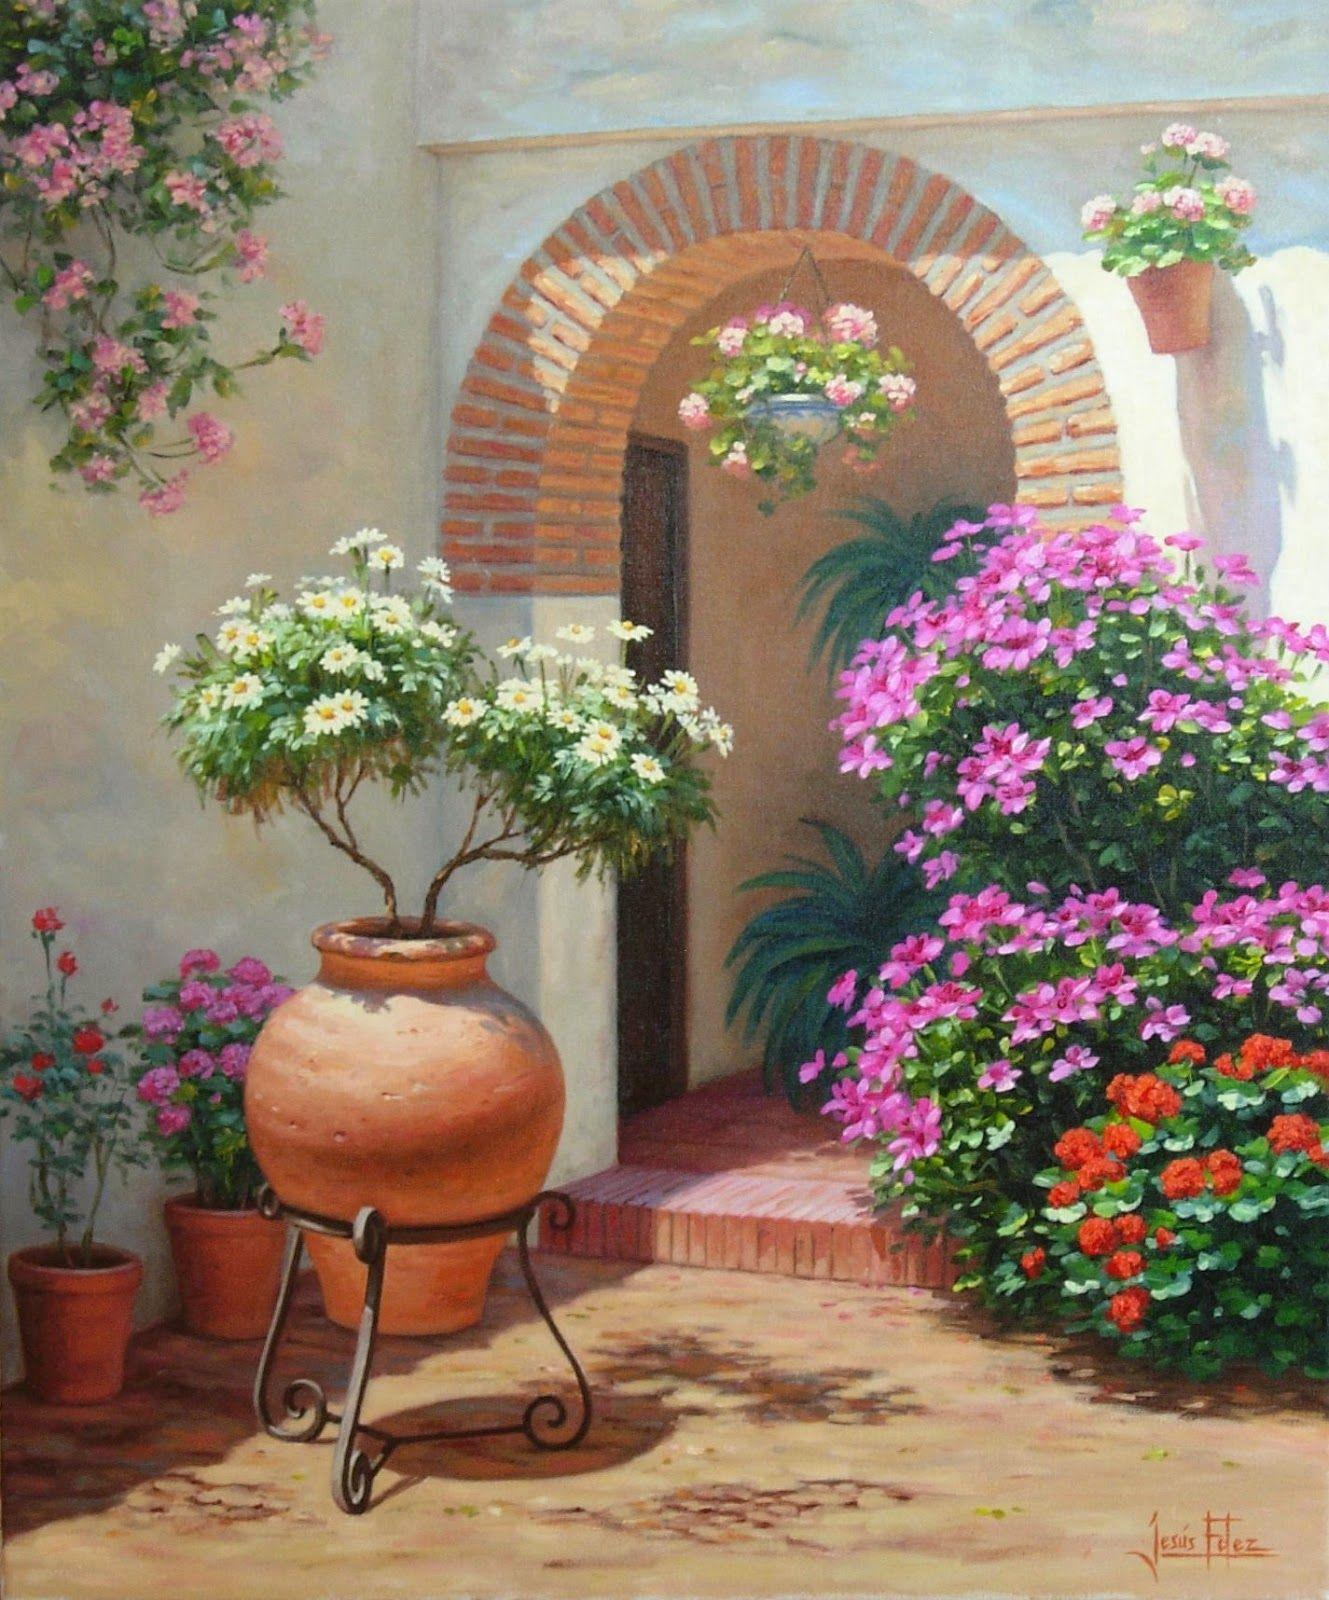 Jesús Fernández Pintor Rincón De Patio Andaluz Paisajes Flores Pintura De Jardín Paisajes